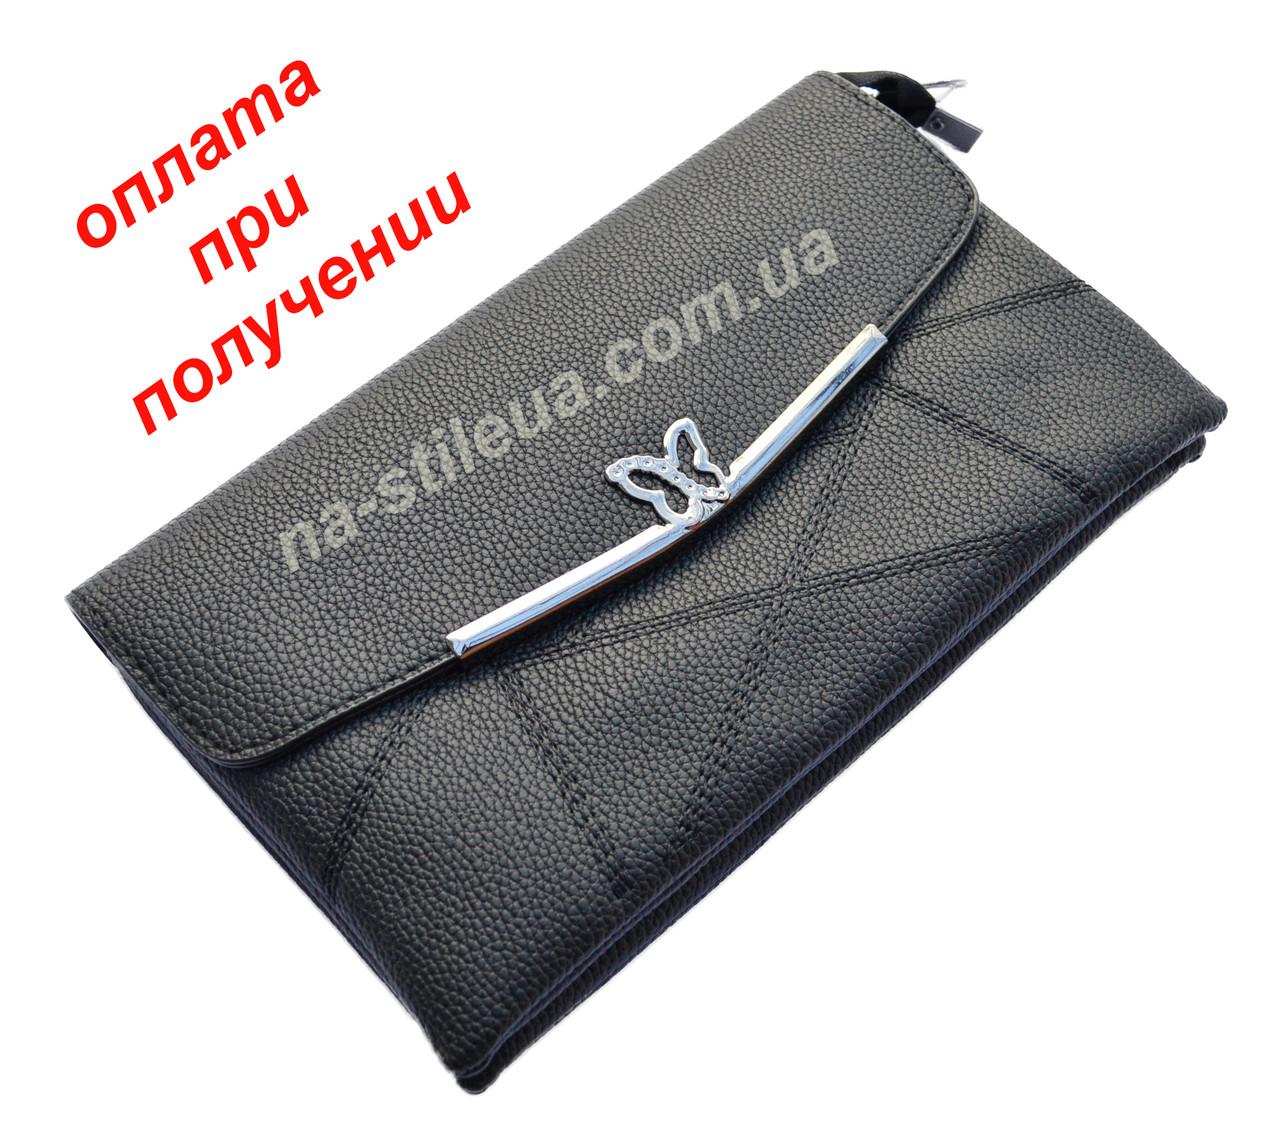 99b5032cca92 Женский кожаный клатч мини сумка кошелек шкіряна через плечо butterfly